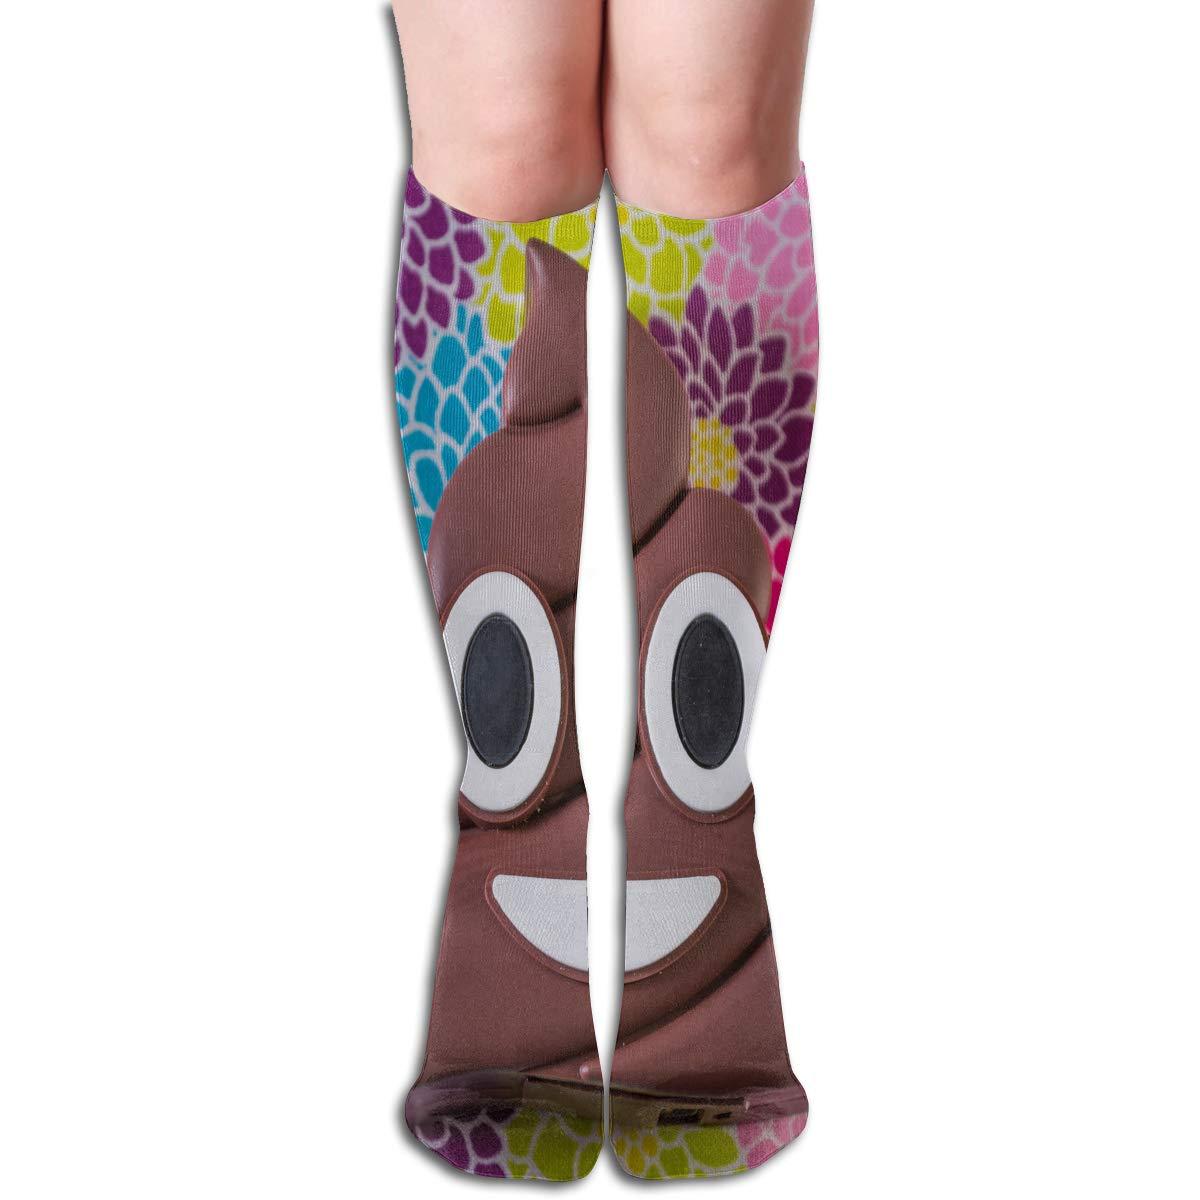 GREENCLOUD Compression Socks Bunny Painting Rabbit Soccer Socks Knee High Socks Running,Athletic,Varicose Veins,Travel,Pregnancy